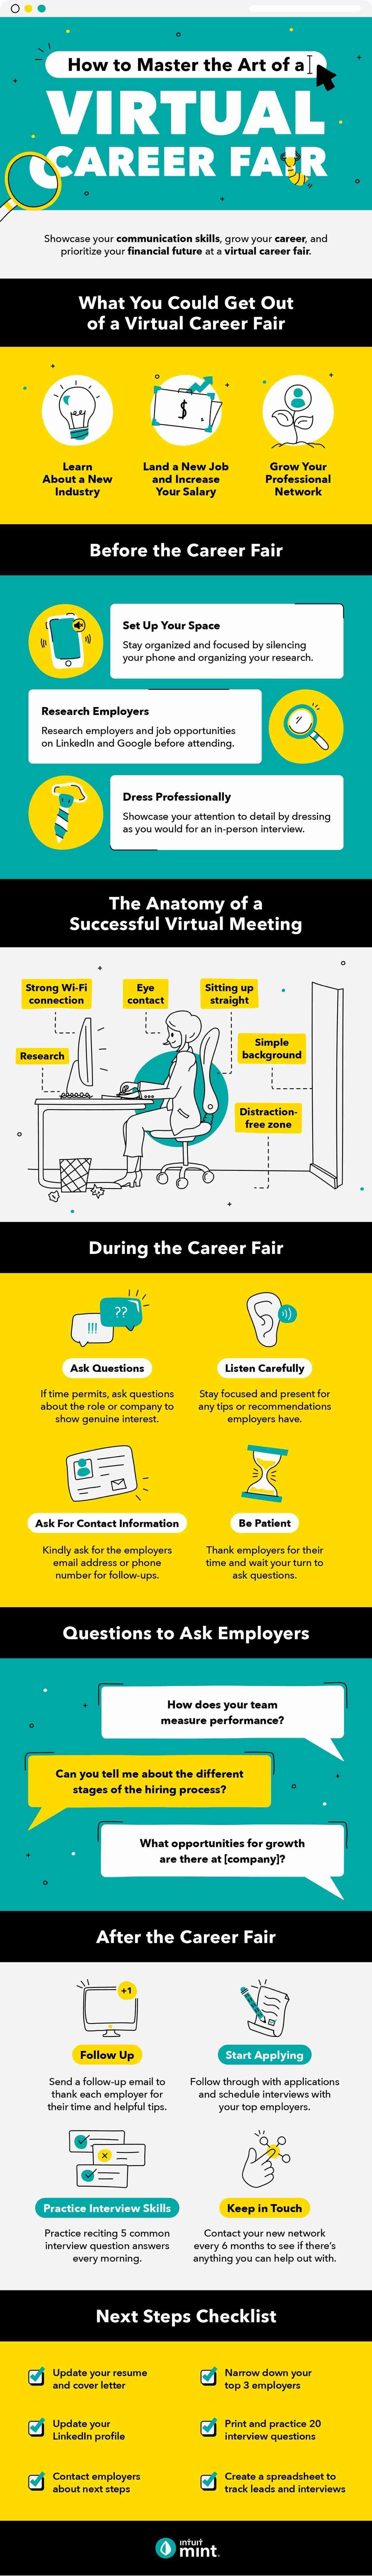 How to Master a Virtual Career Fair (+ Land Your Dream Job)